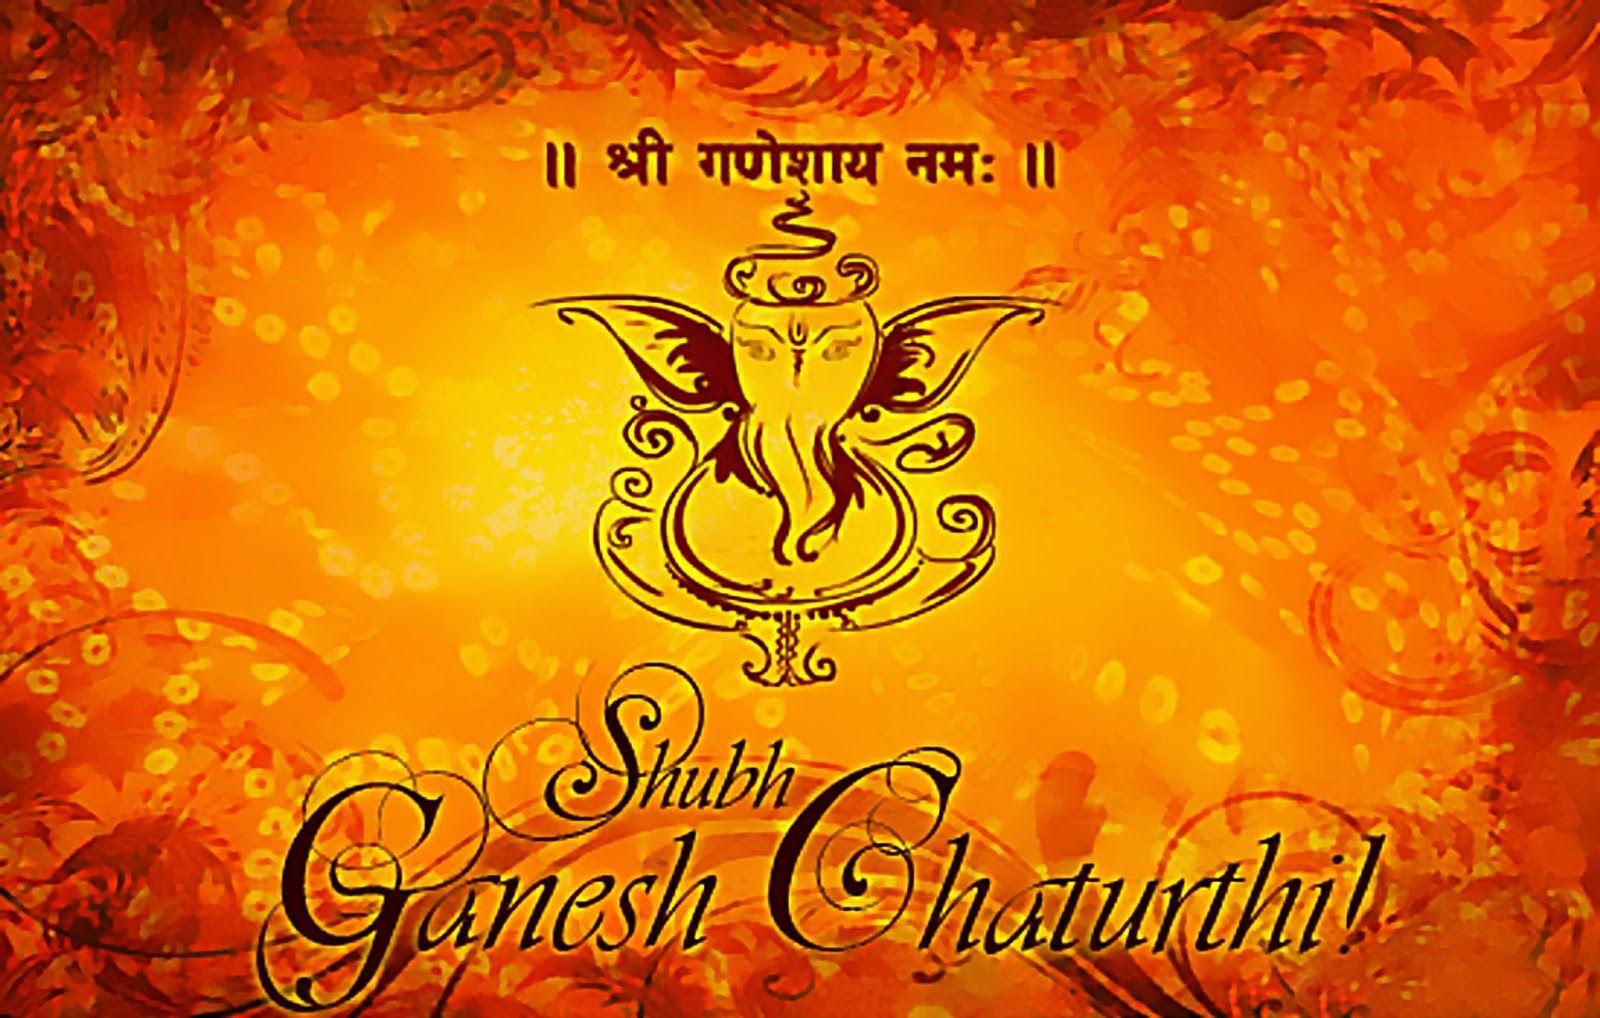 Happy Ganesh Chaturthi Whatsapp Status Messages 5g 16001018